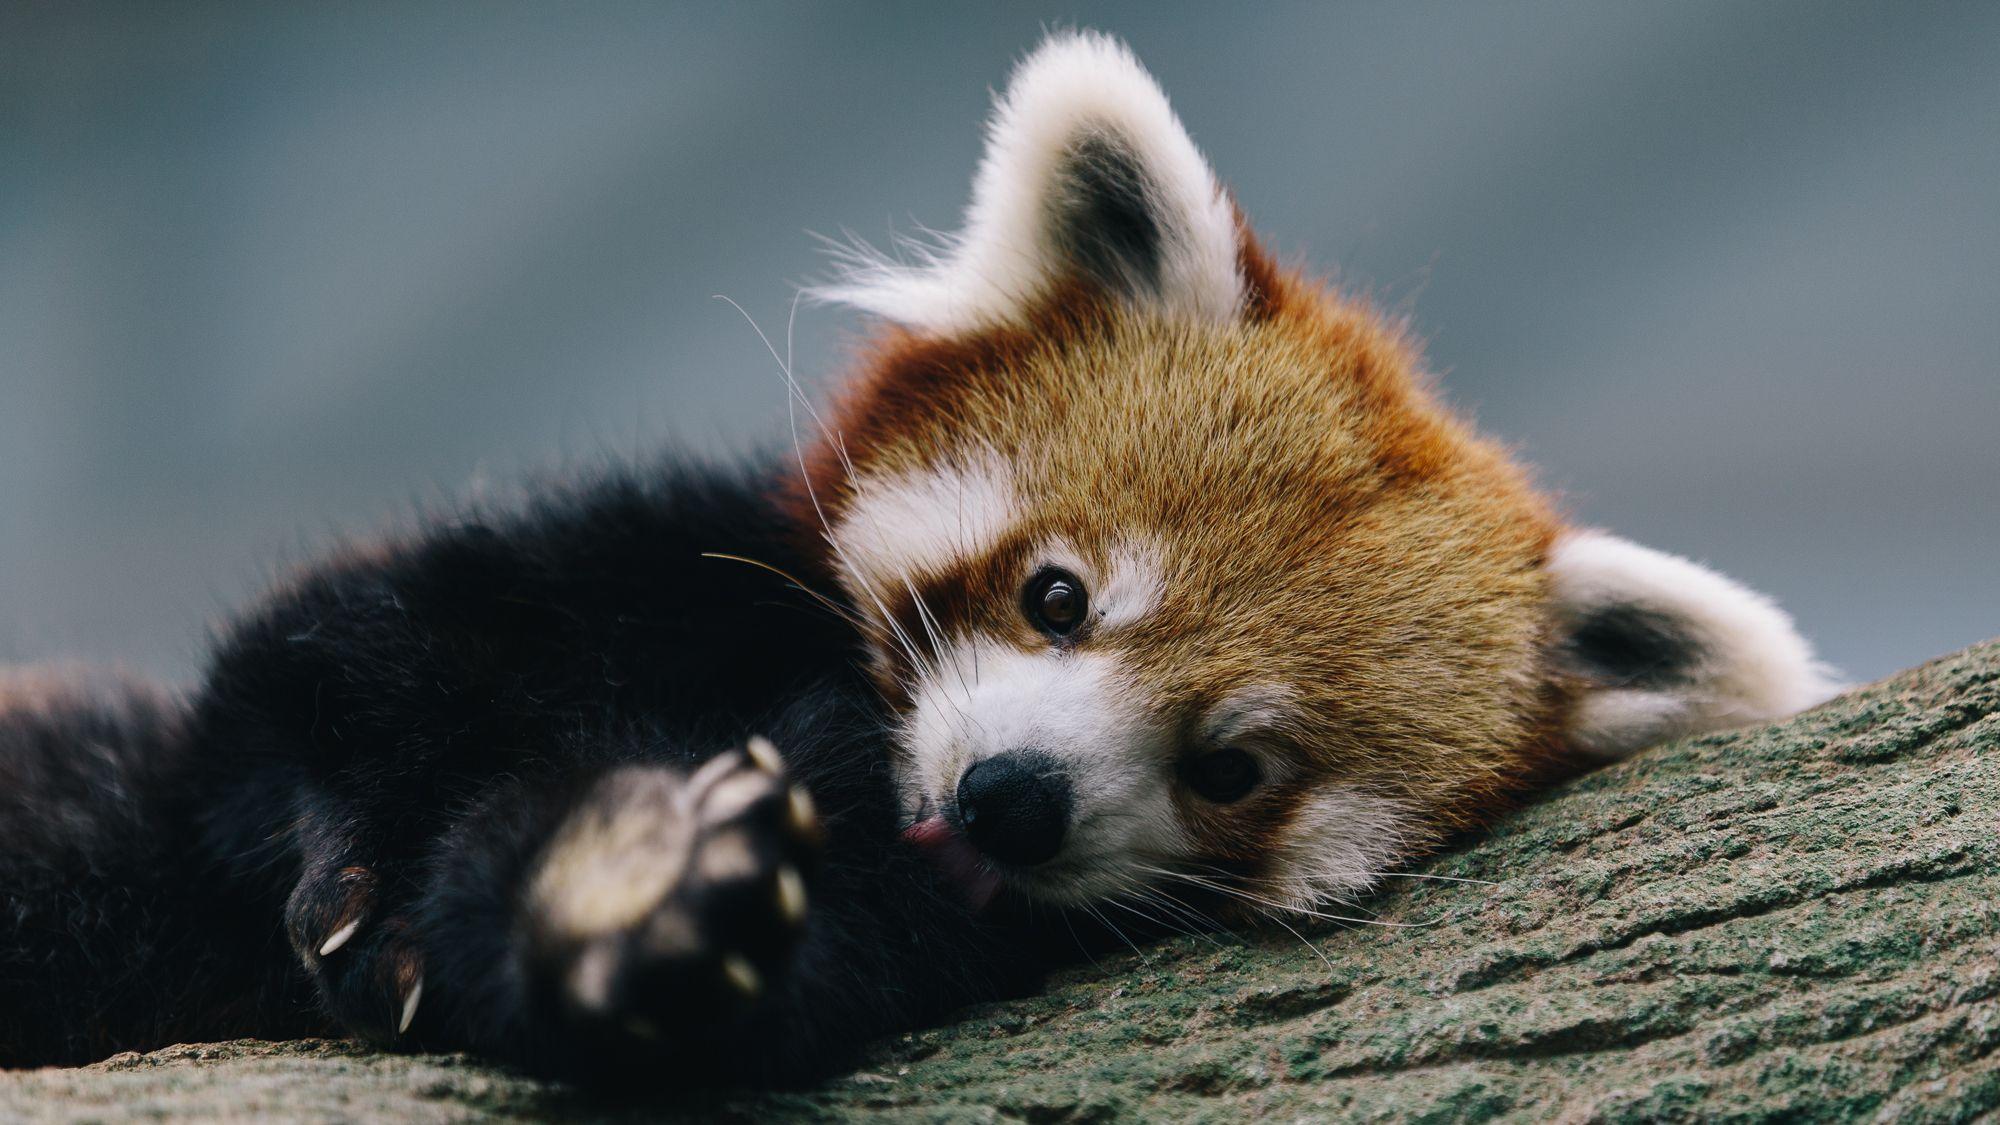 animaux panda roux panda mignon fond d 39 cran panda roux pinterest panda mignon pandas. Black Bedroom Furniture Sets. Home Design Ideas